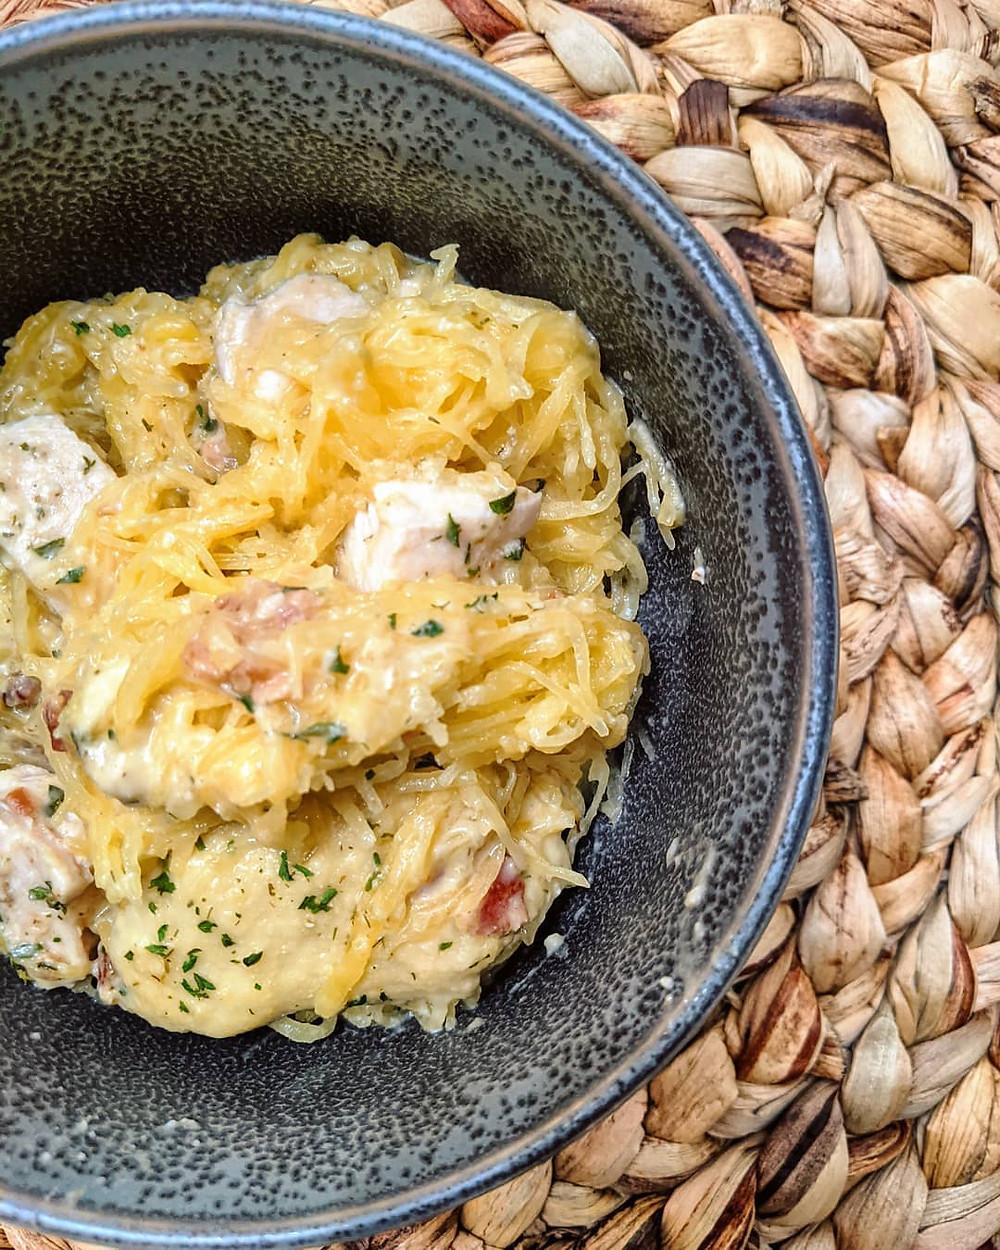 The Sunday Cookbook - Chicken Bacon Ranch Spaghetti Squash - Joseph Centineo - food allergy recipes